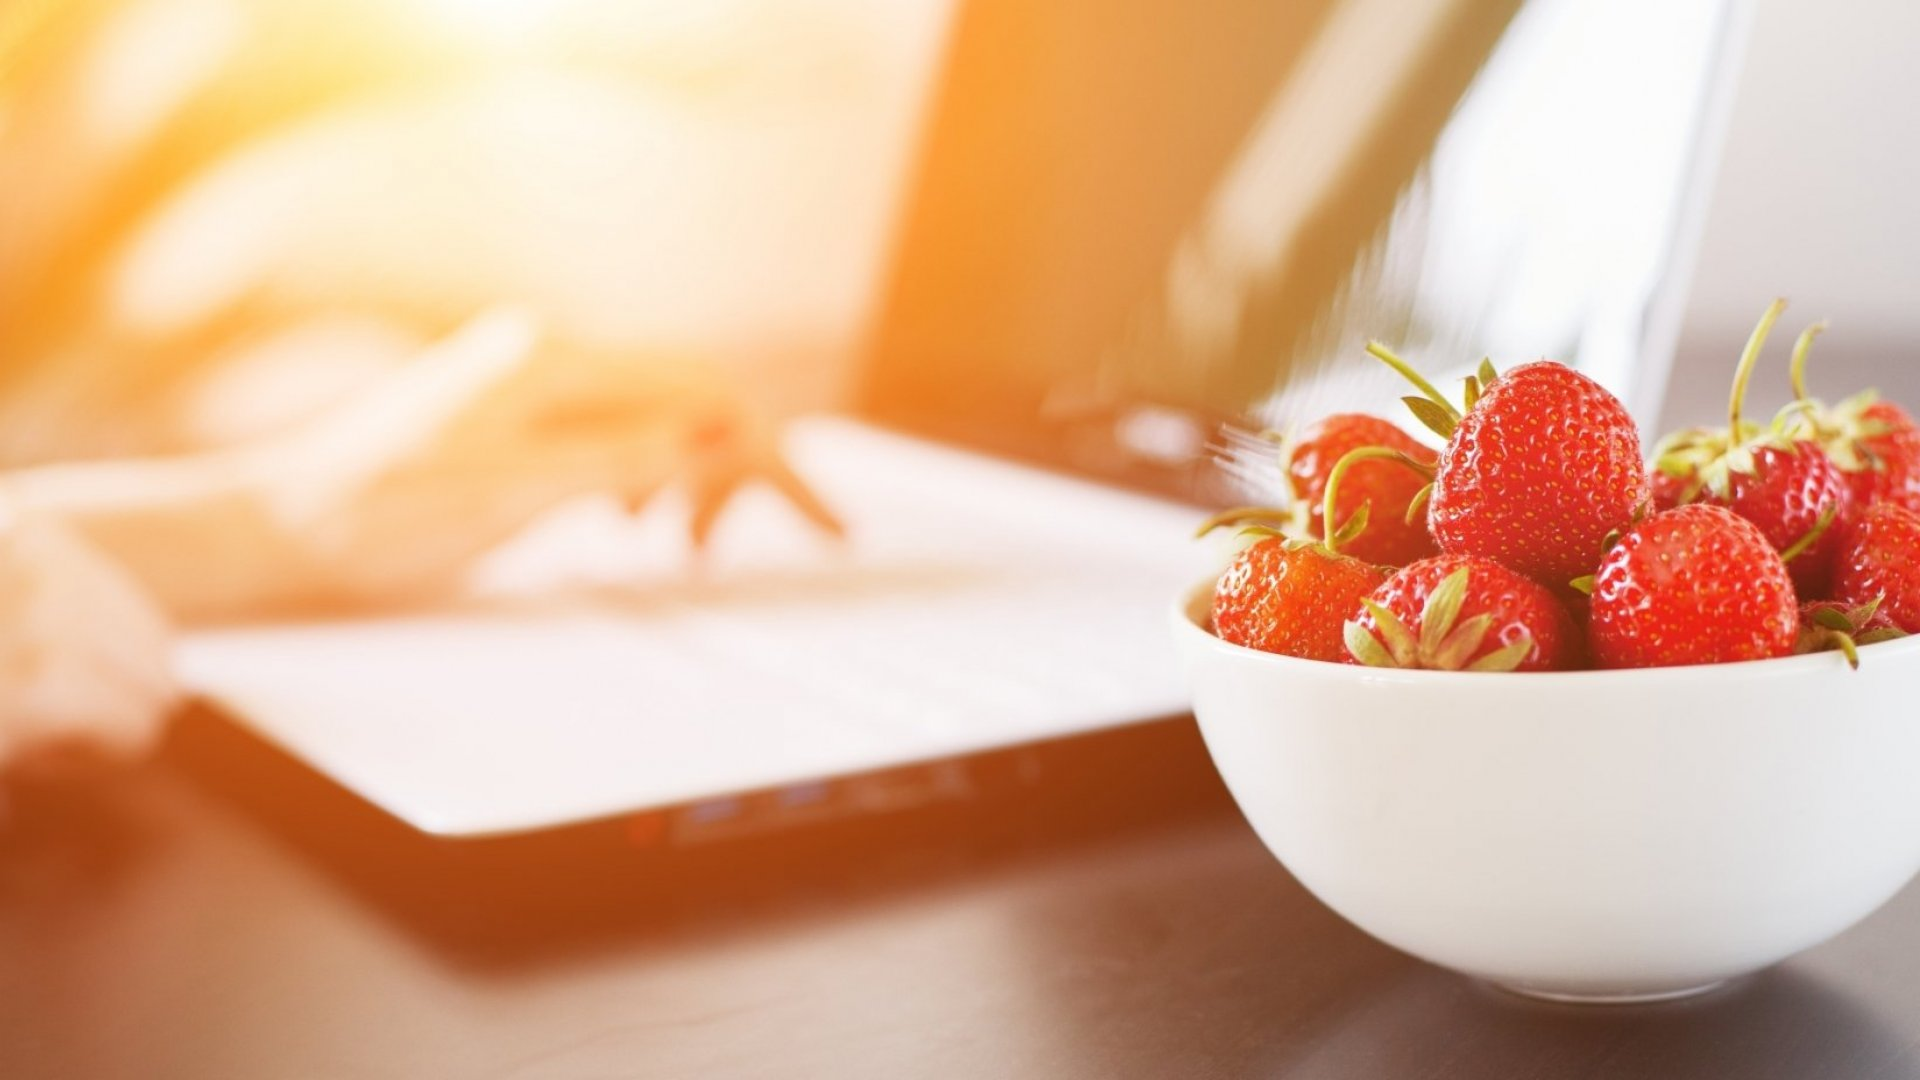 5 Ways To Build Healthier Habits at Work